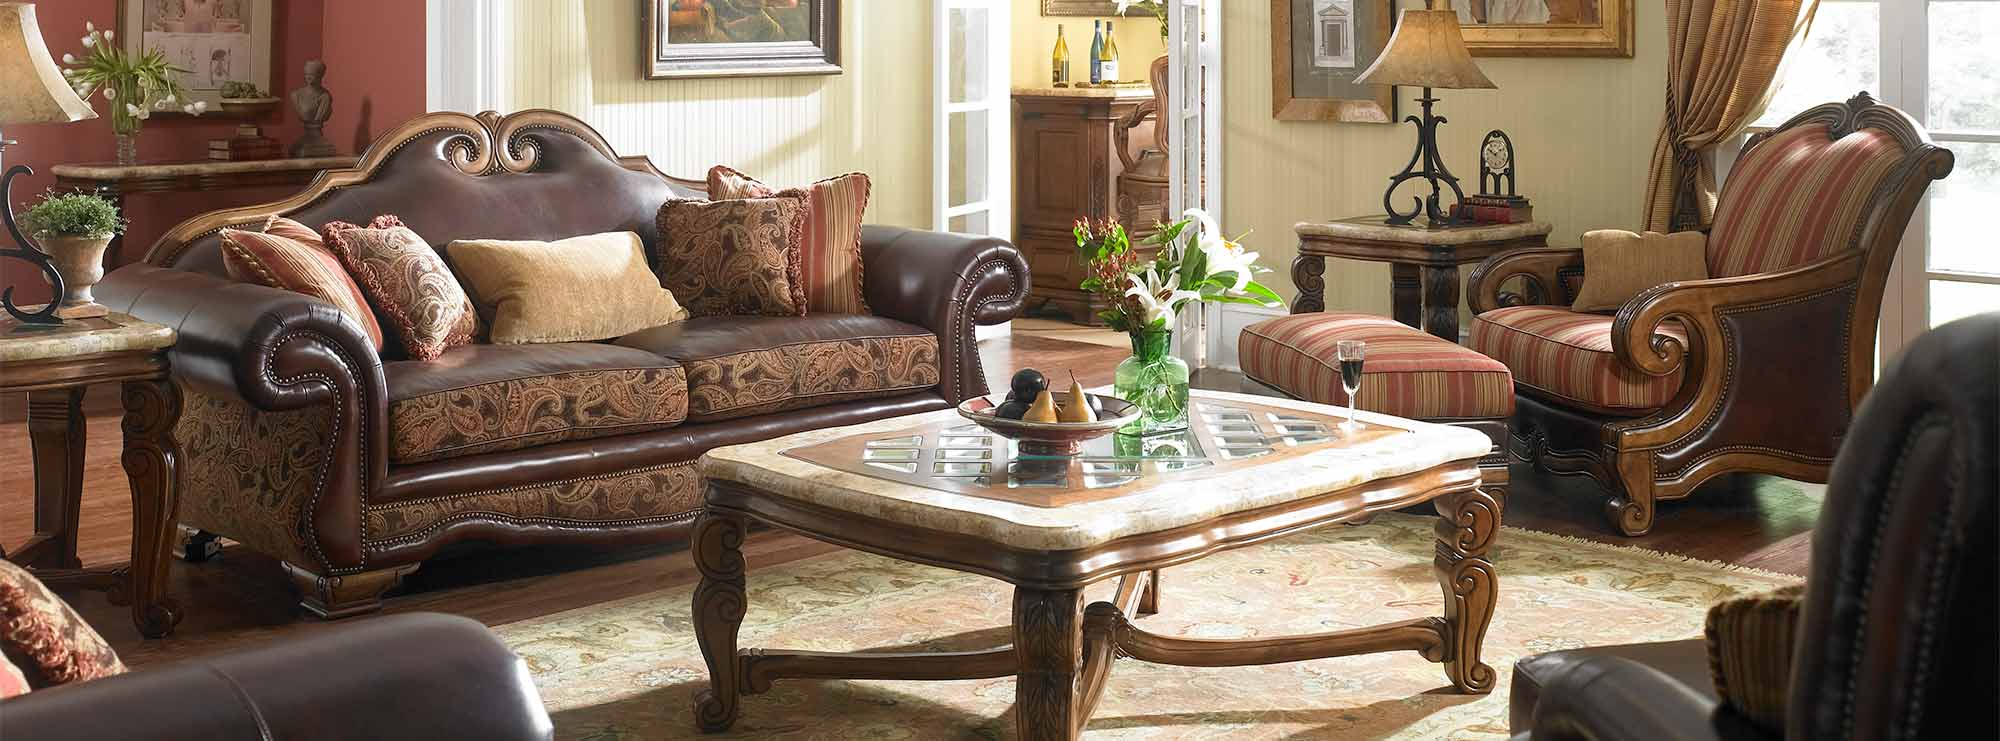 Tuscano Catrina S Interiors Furniture Store And Interior